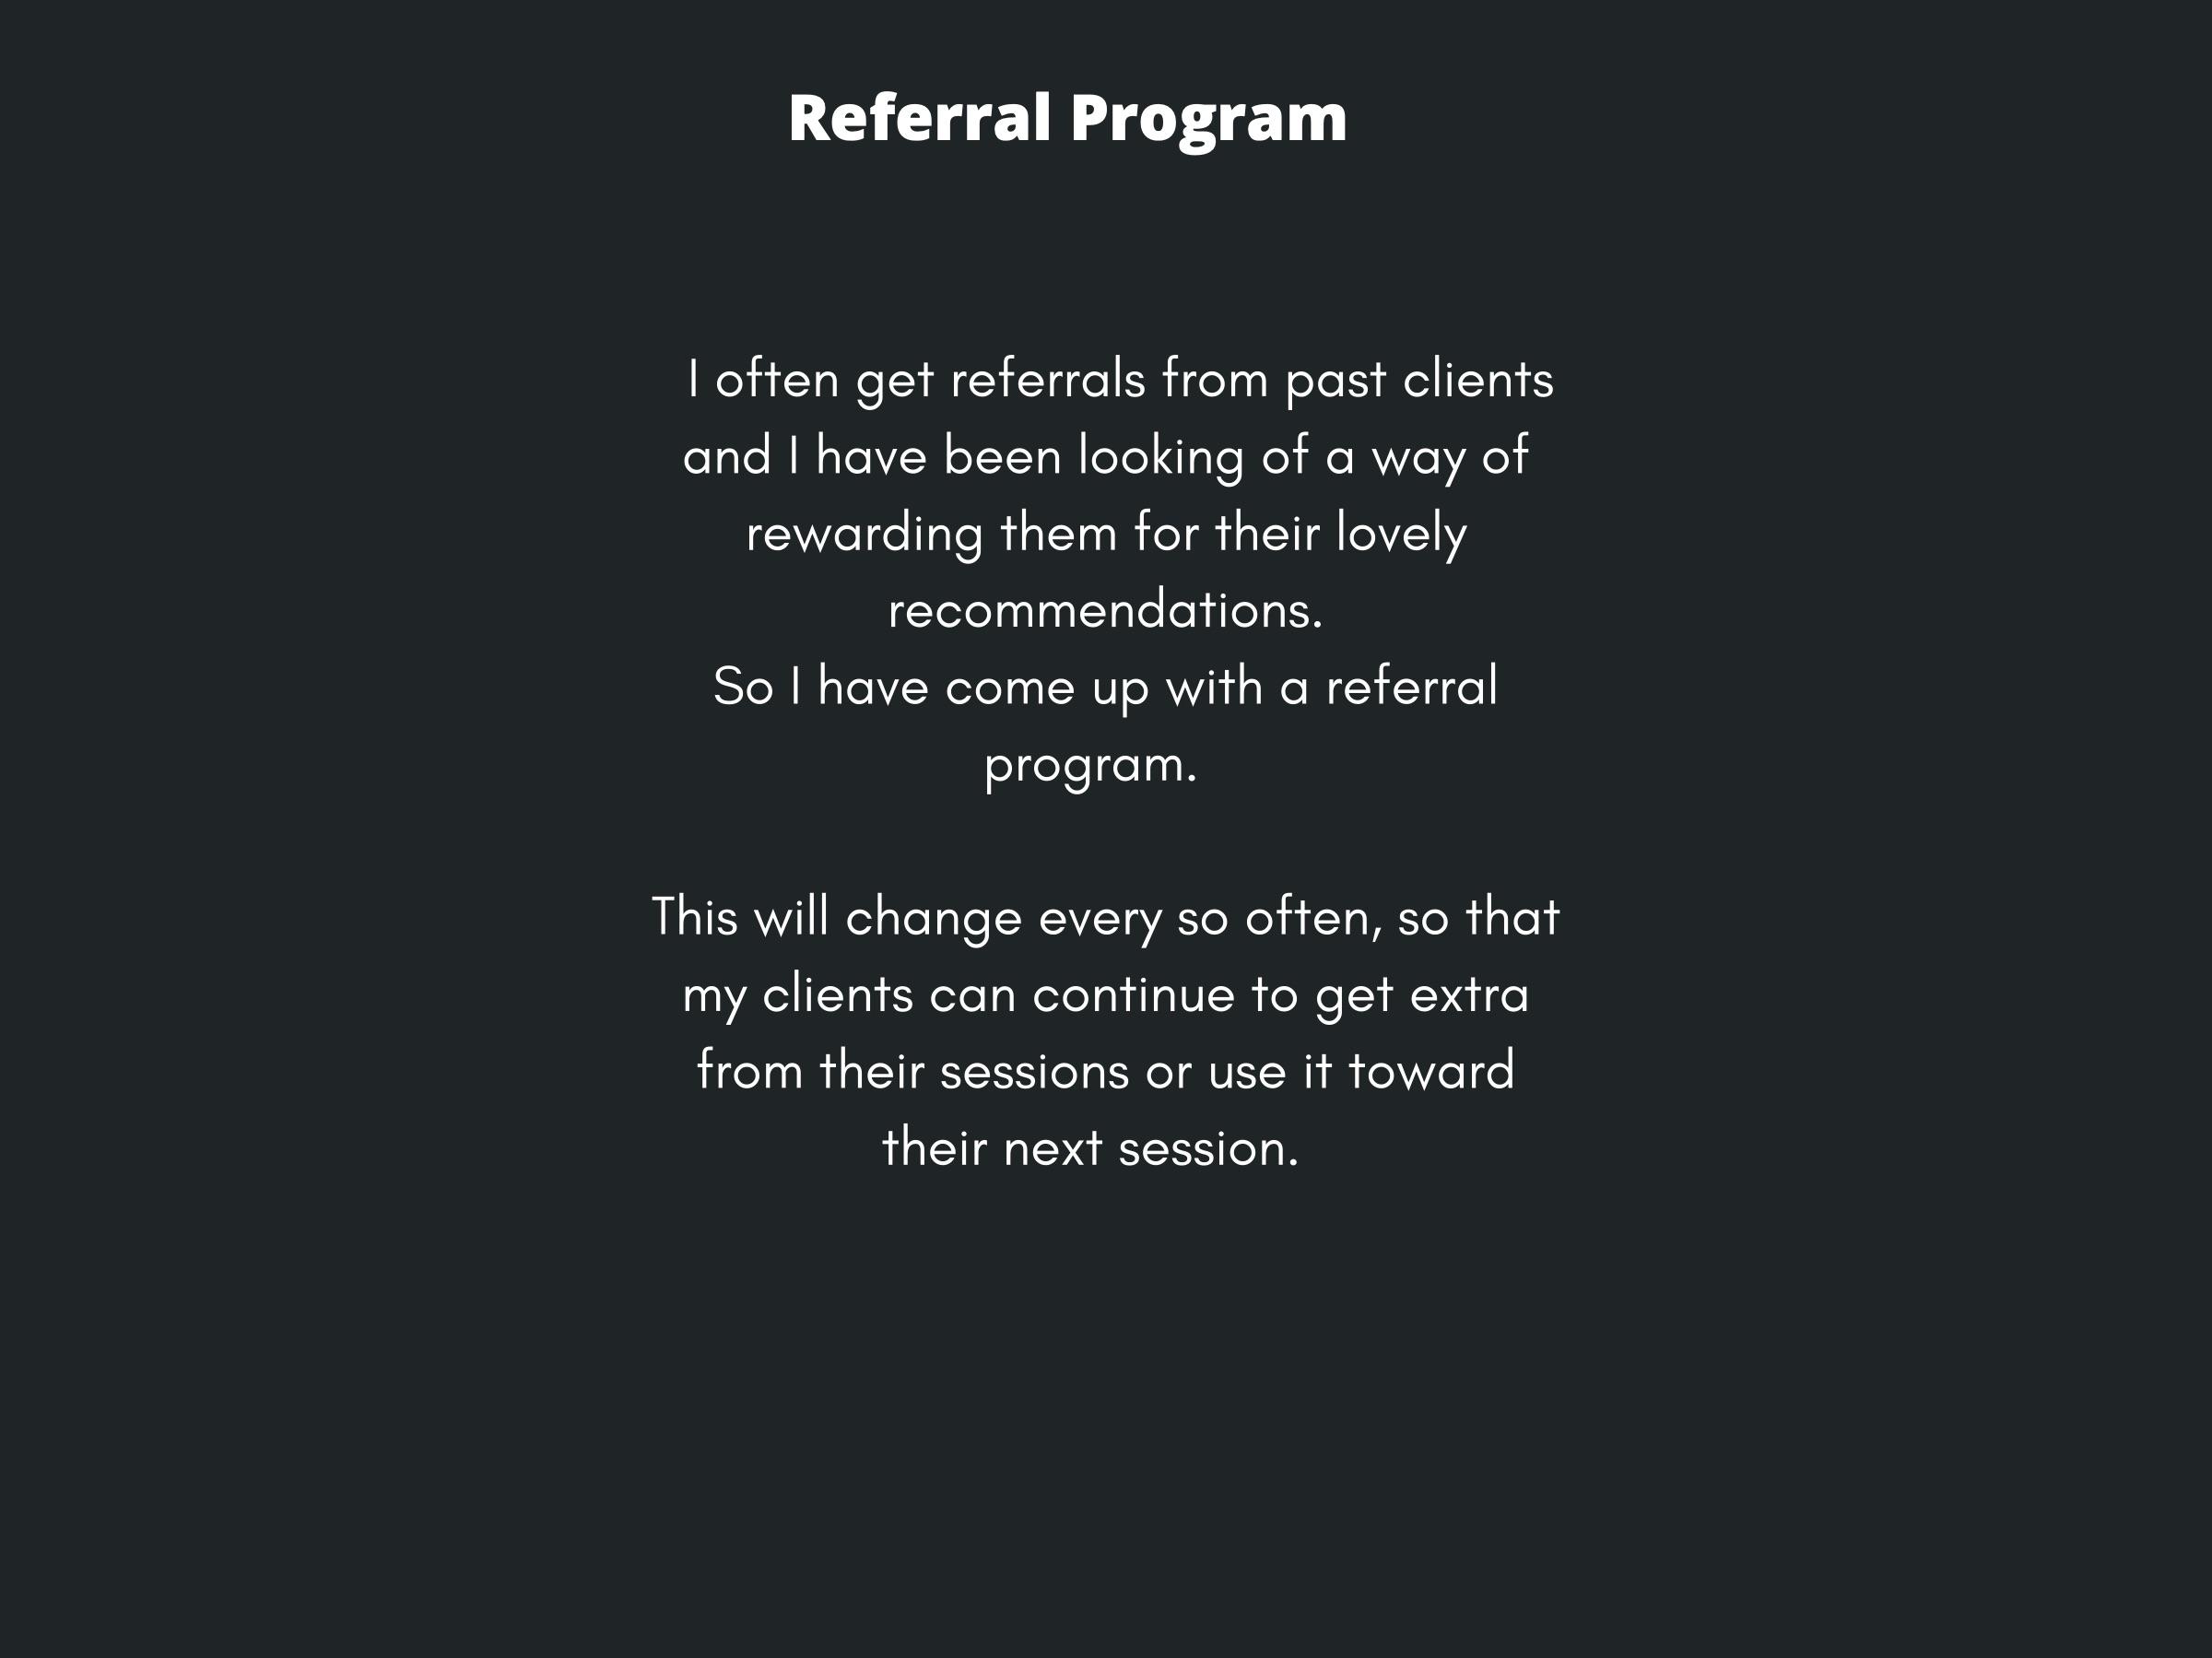 Referal-Program-2